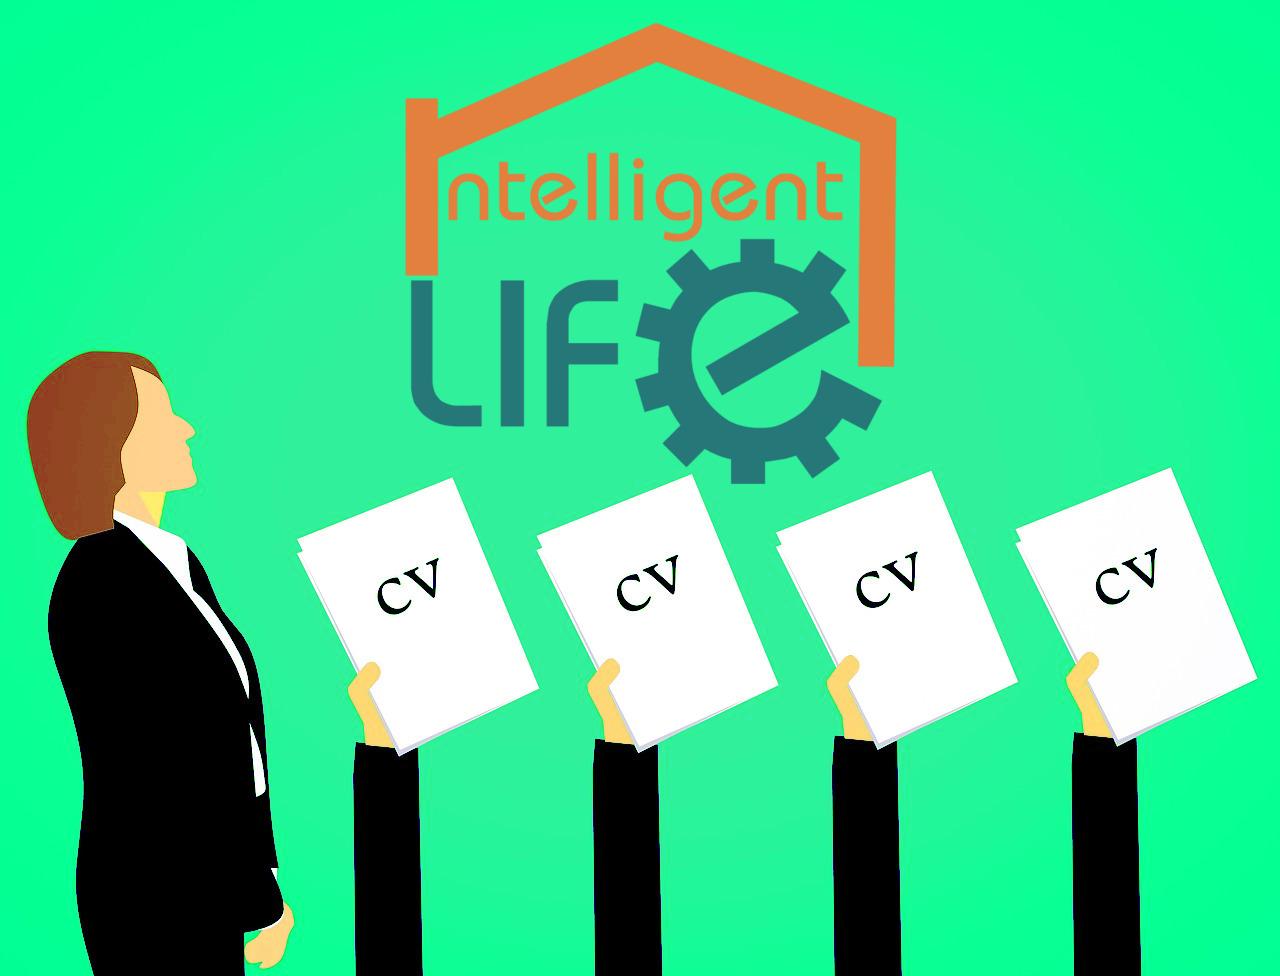 Software crm recursos humanos CV Intelligent life